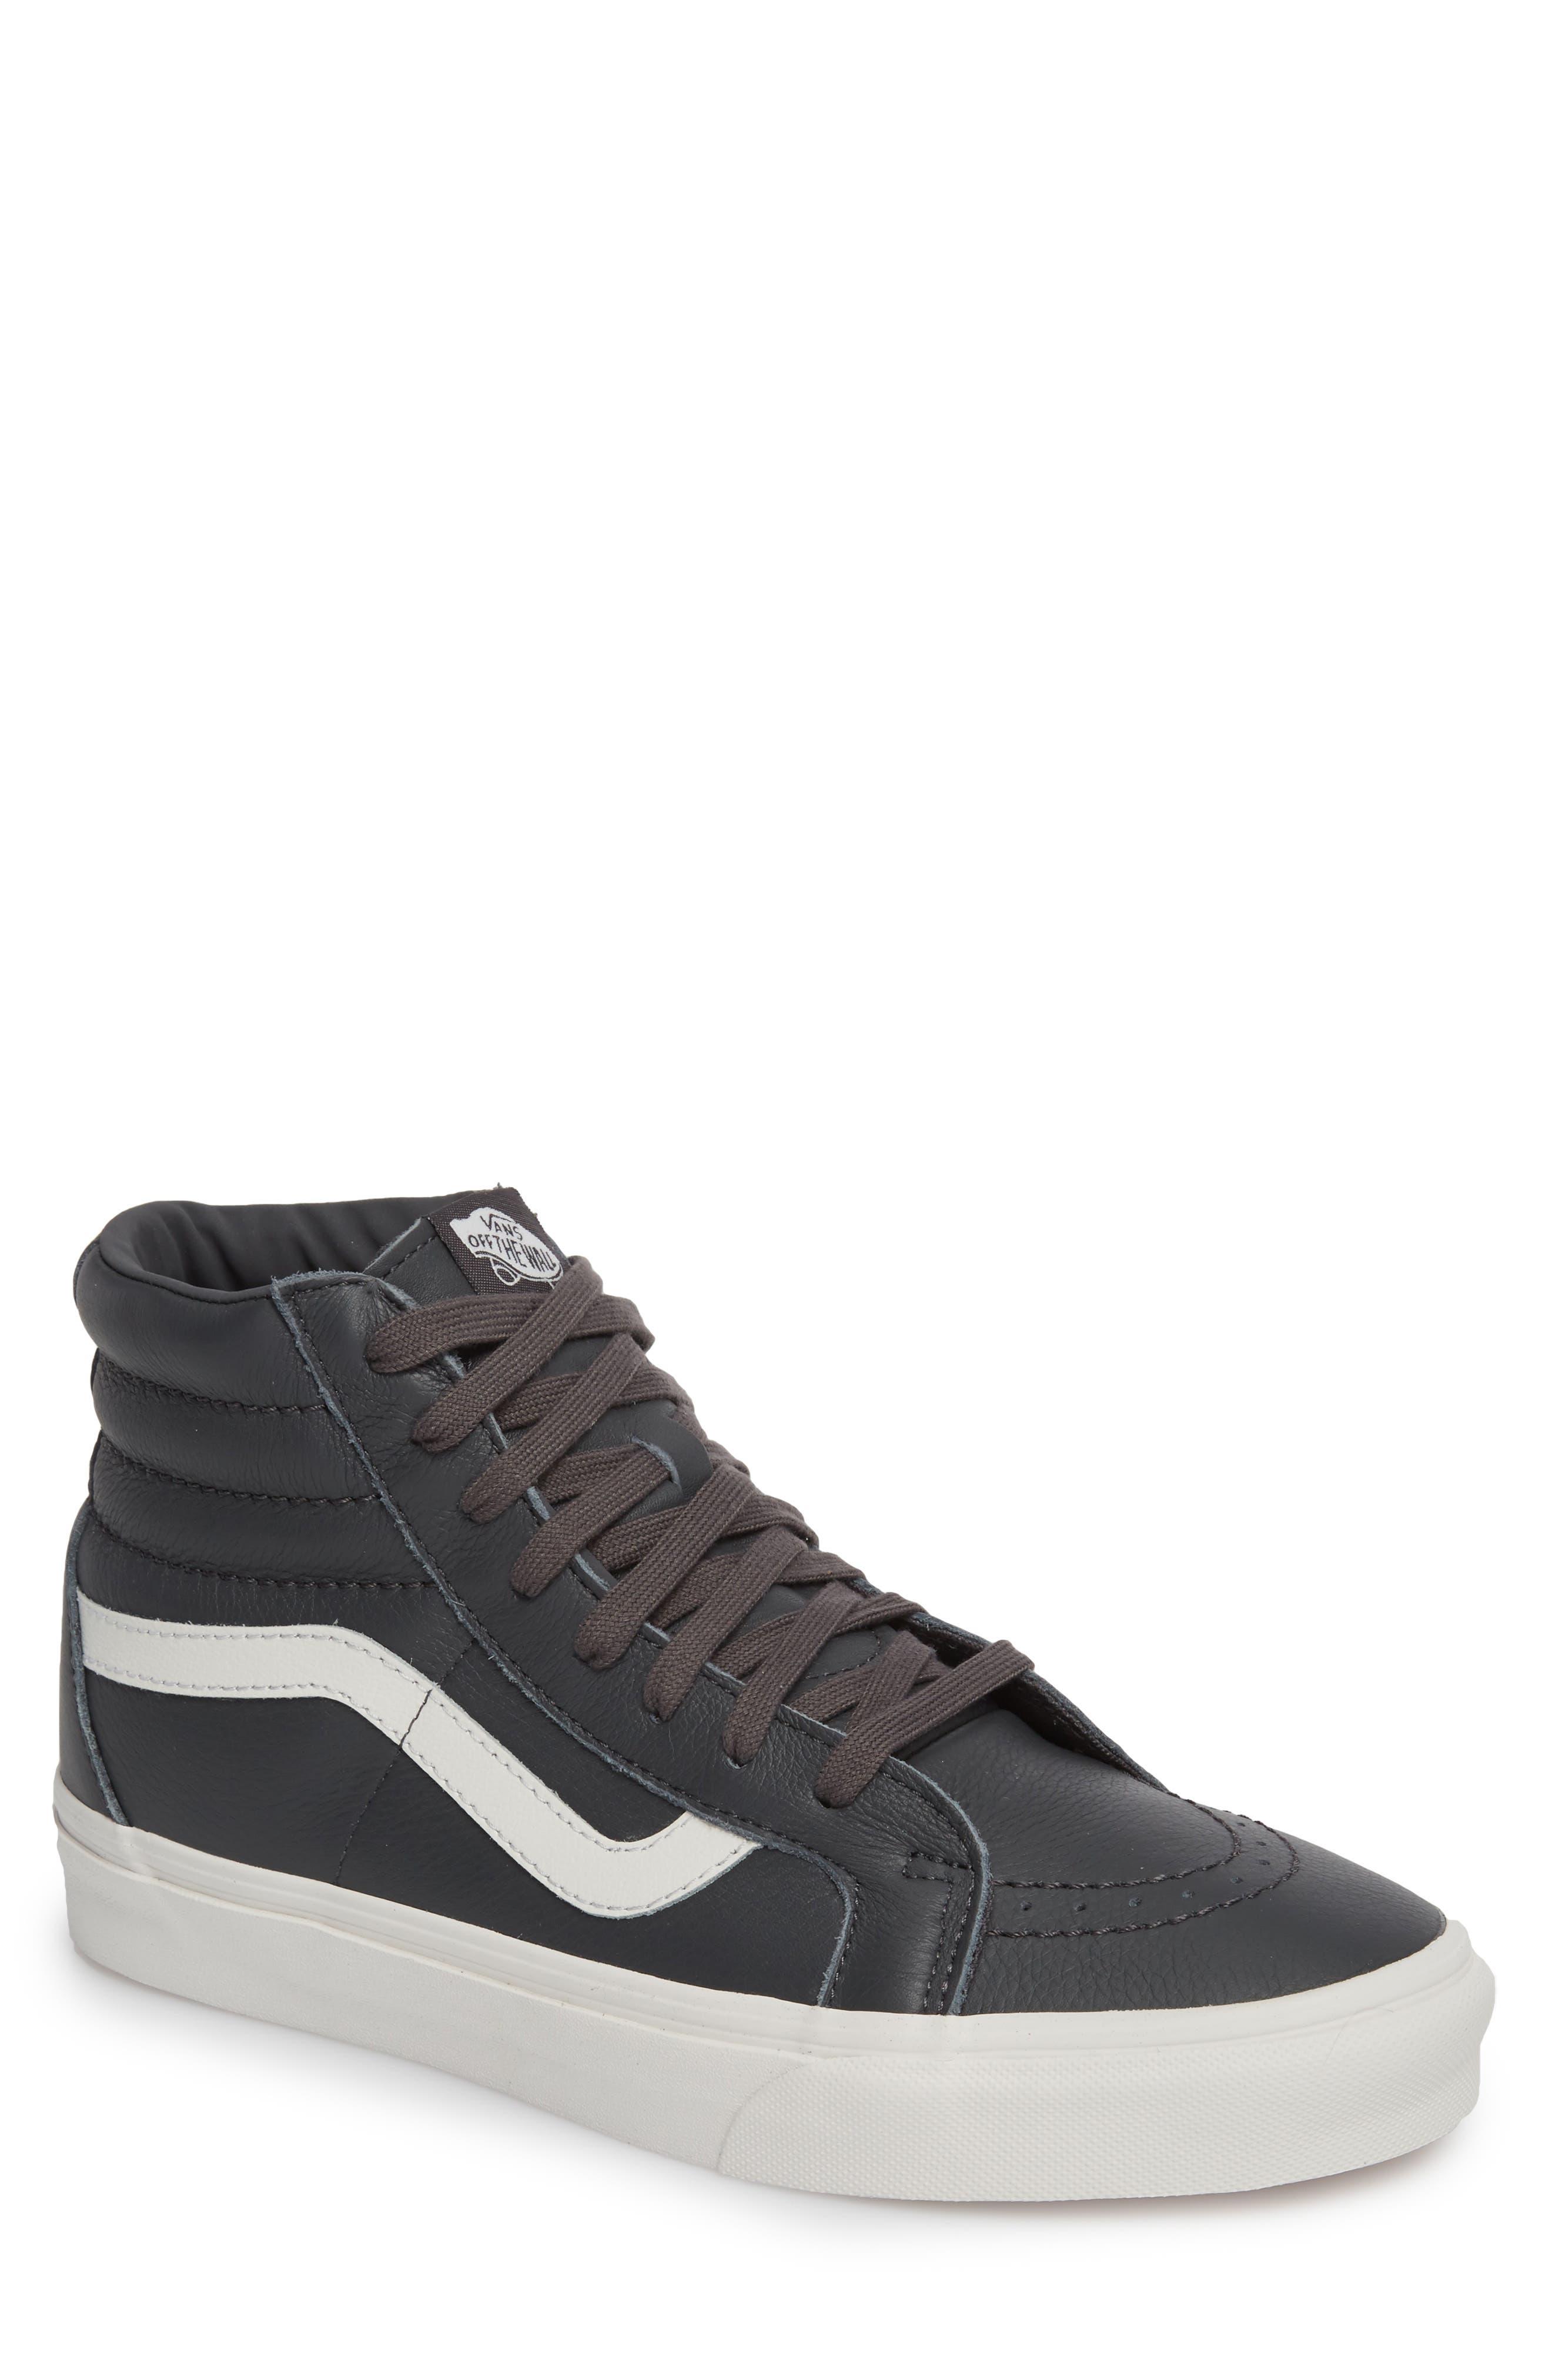 Sk8-Hi Reissue Leather Sneaker,                             Main thumbnail 1, color,                             020